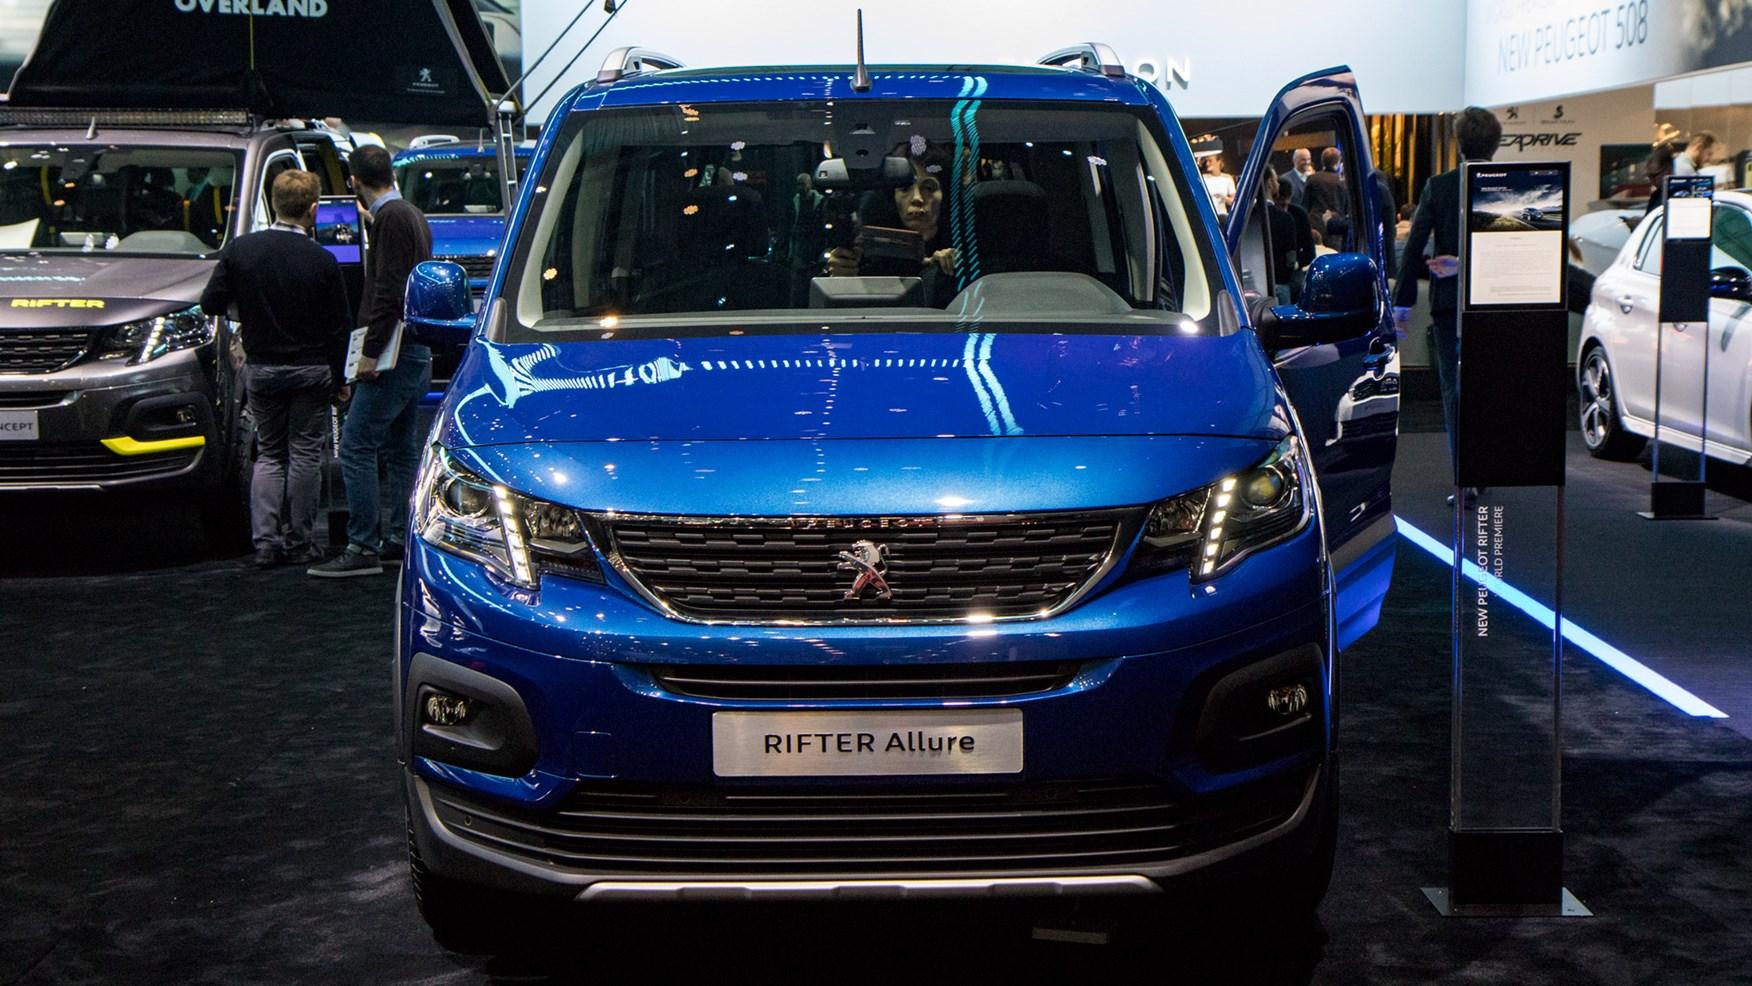 Car Insurance Company >> Peugeot Rifter: UK price of MPV revealed | CAR Magazine